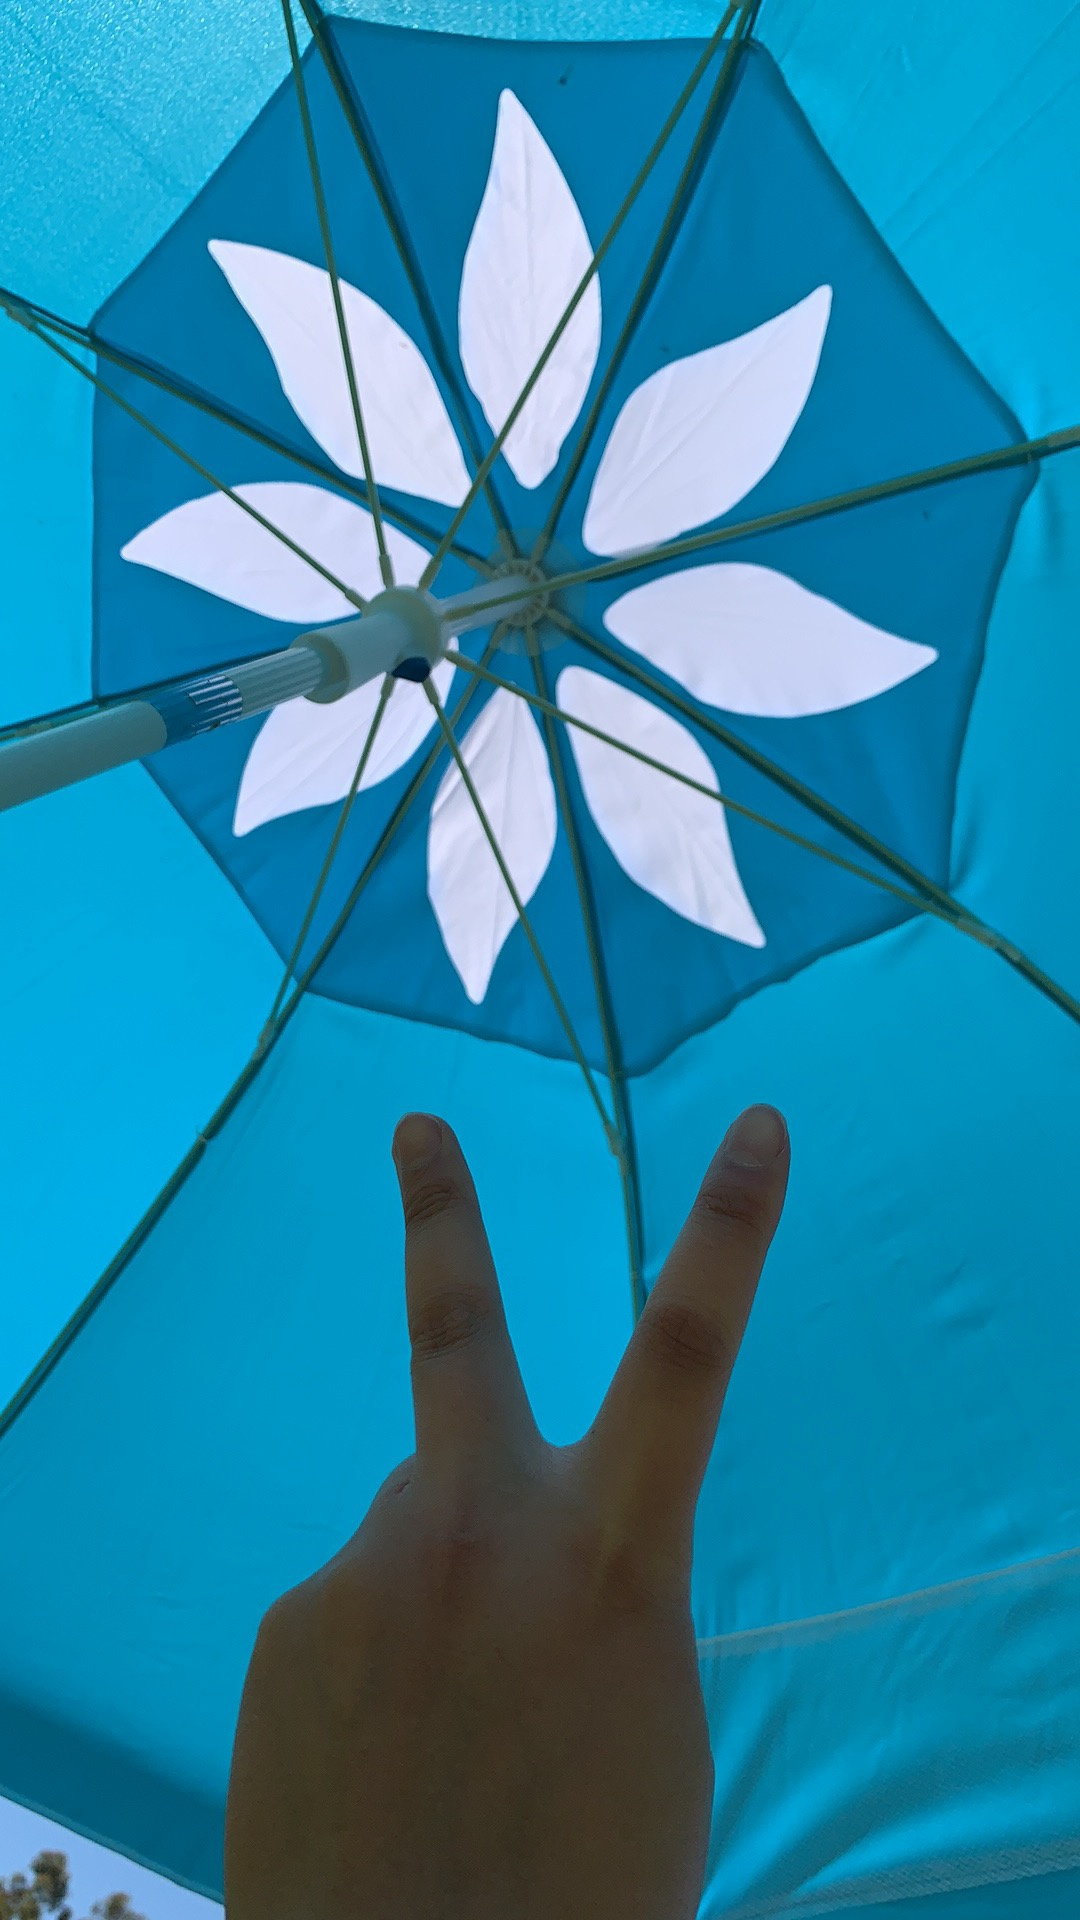 NiceC Beach Umbrella 6.5ft Portable Adjustable Tilt with Sand Anchor, Aluminum Patio Umbrella Outdoor, Pool, Garden UV 50+ with Carry Case photo review